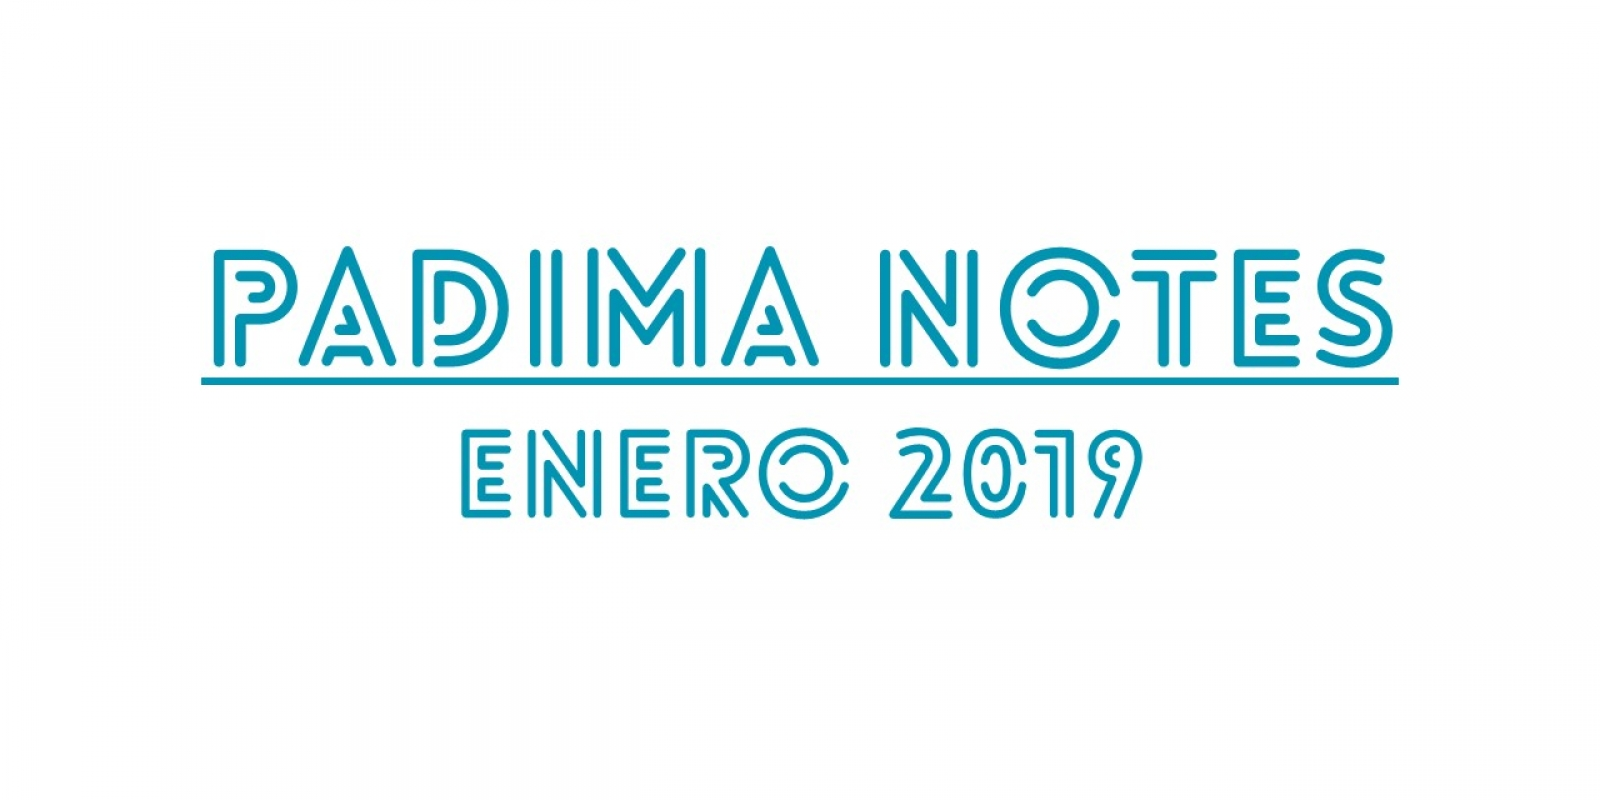 Padima Notes enero 2019